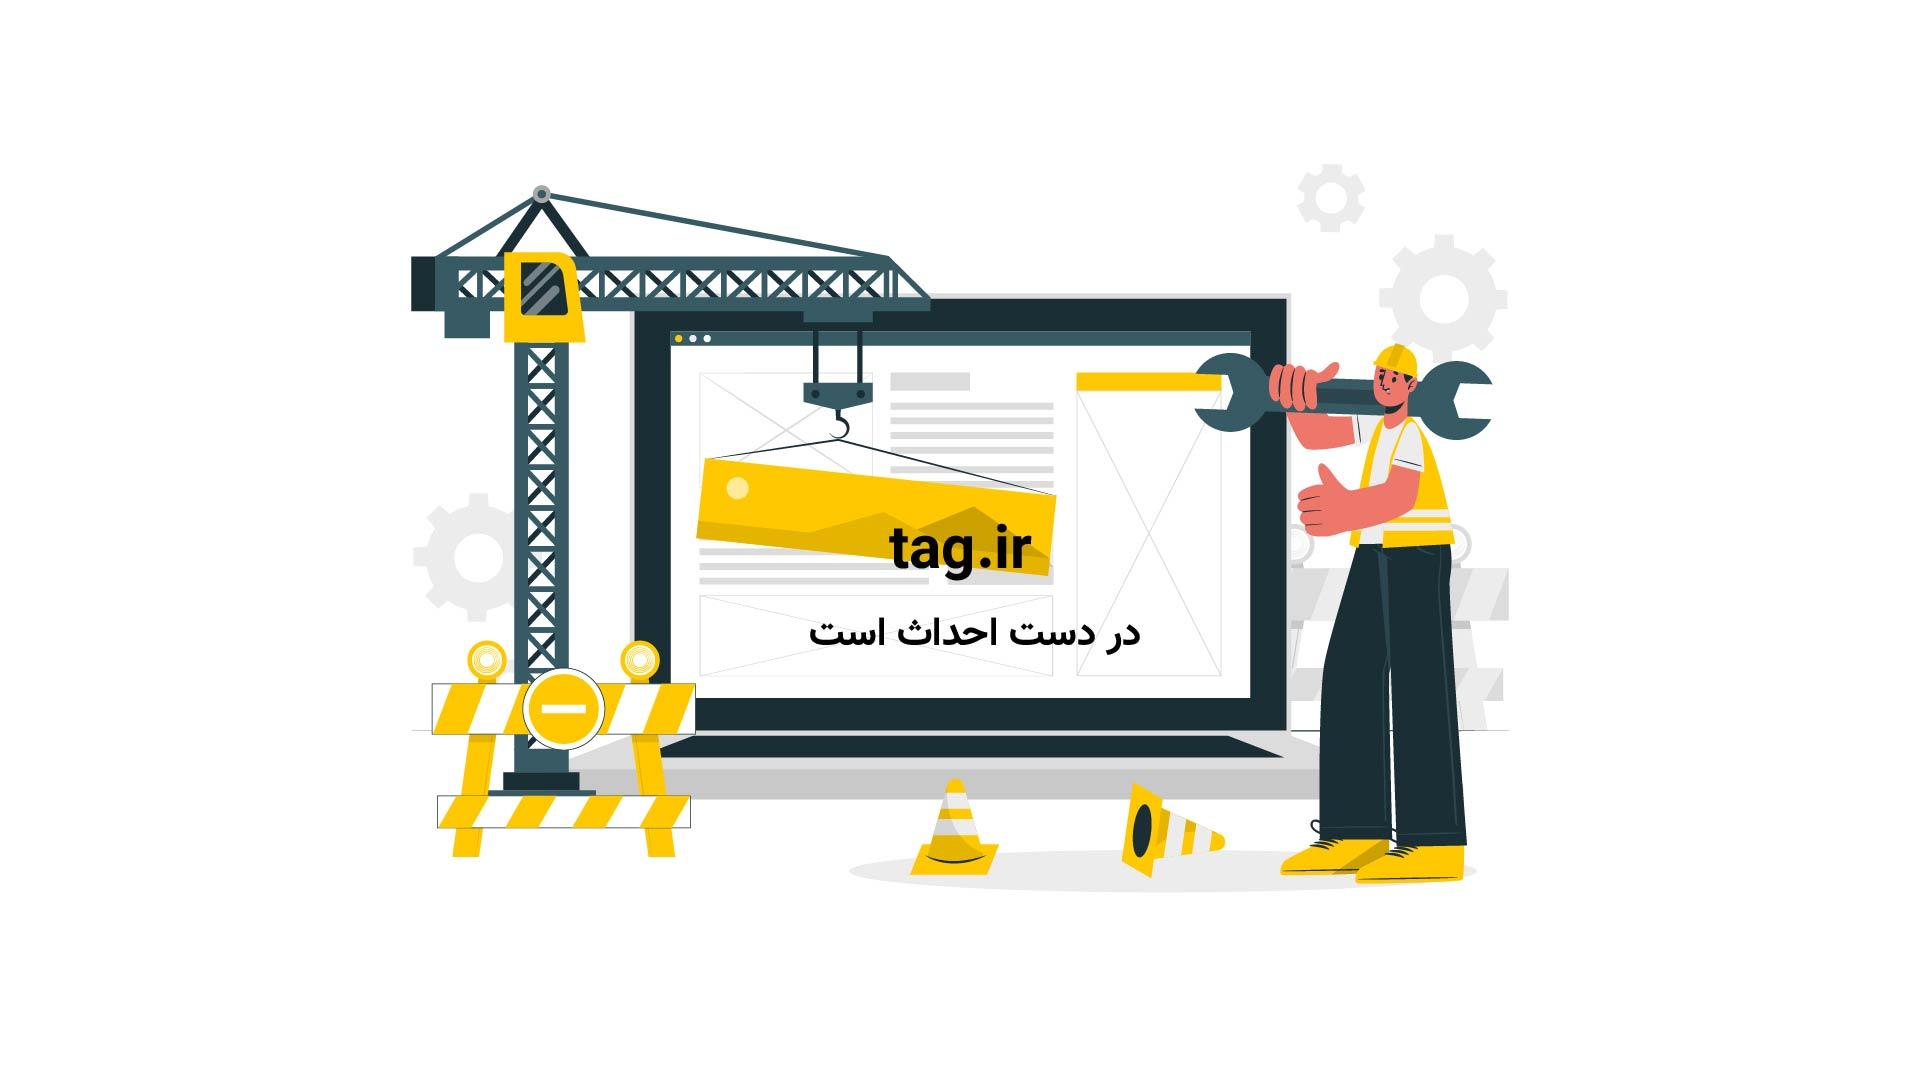 مداحی مسعود پیرایش هیئت صاحب العصر (عج) | فیلم